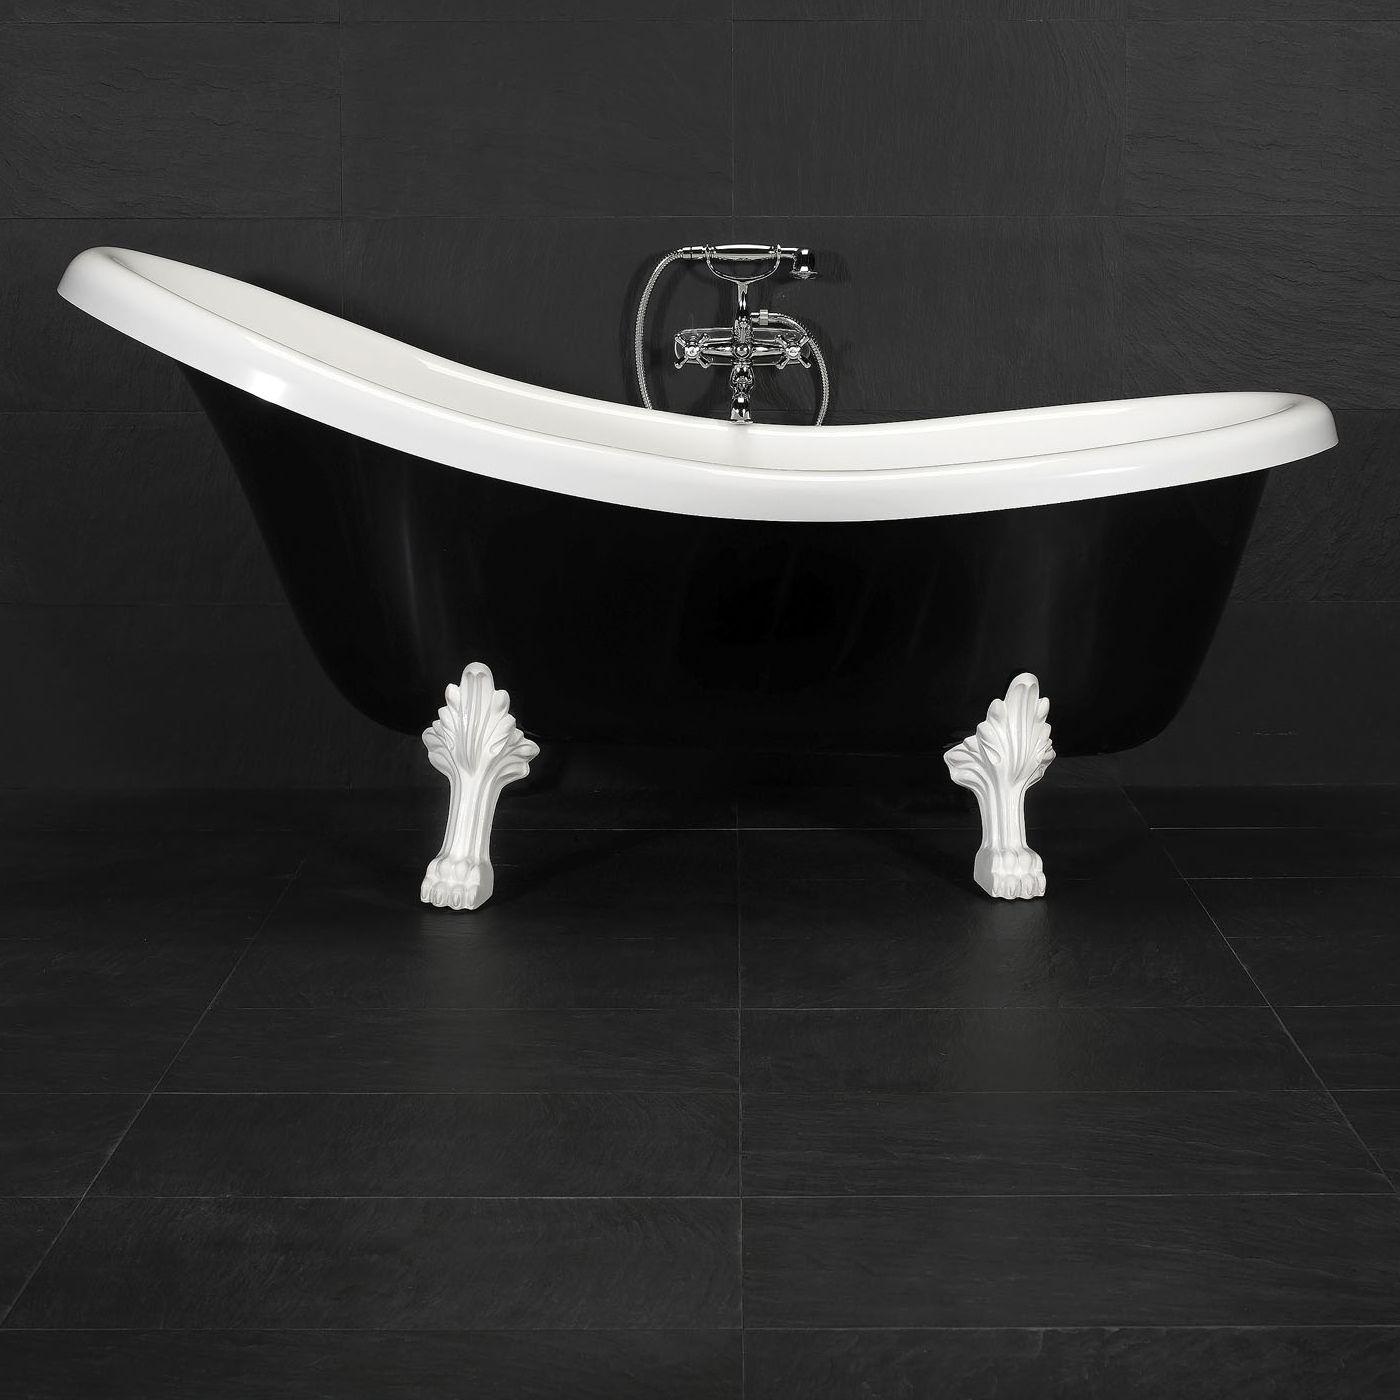 Klassinen tassuamme ripauksella modernismia. - Classic bathtub with a modern twist.